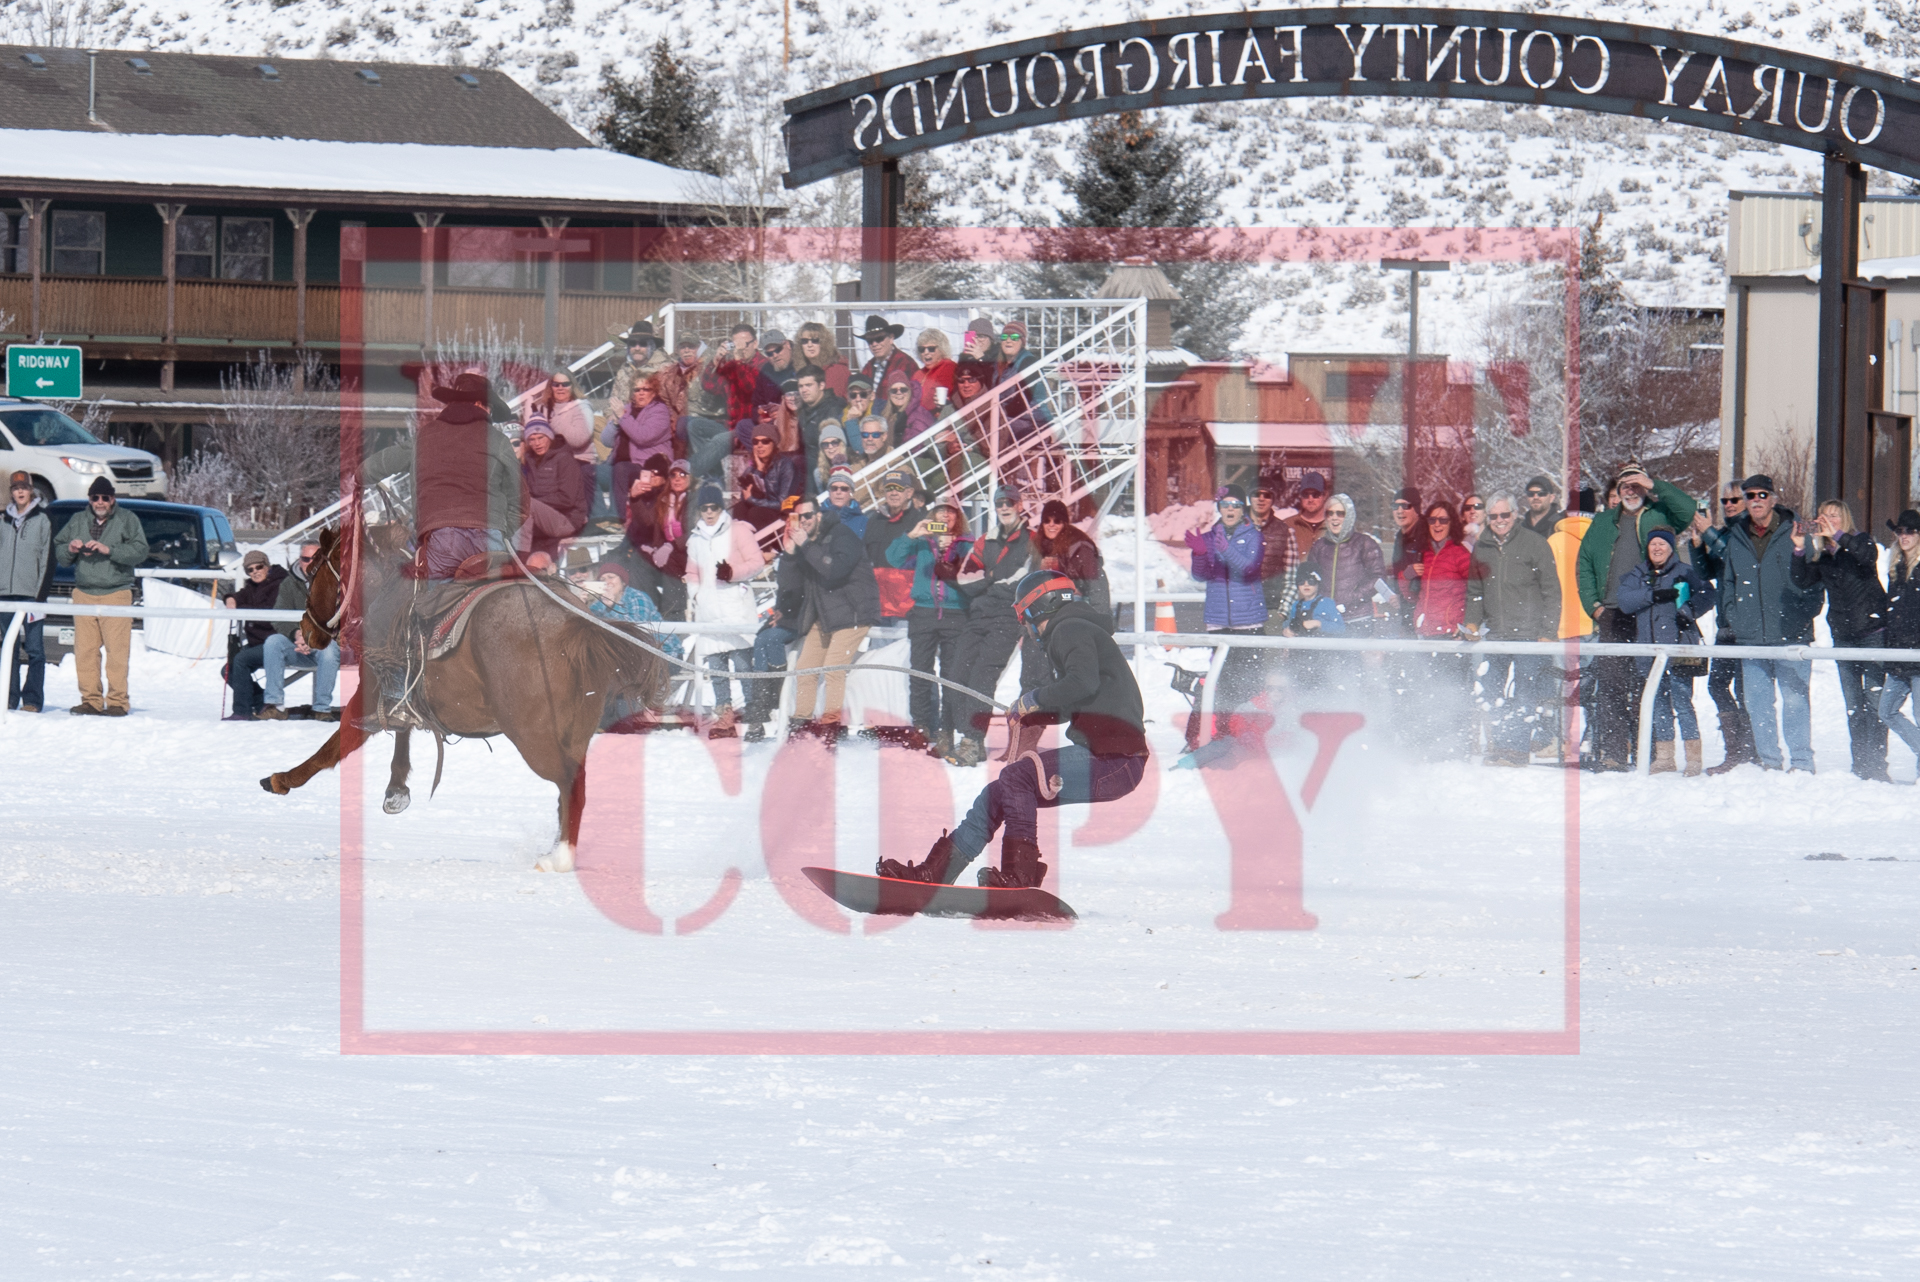 - JW Goode - Snowboard 13